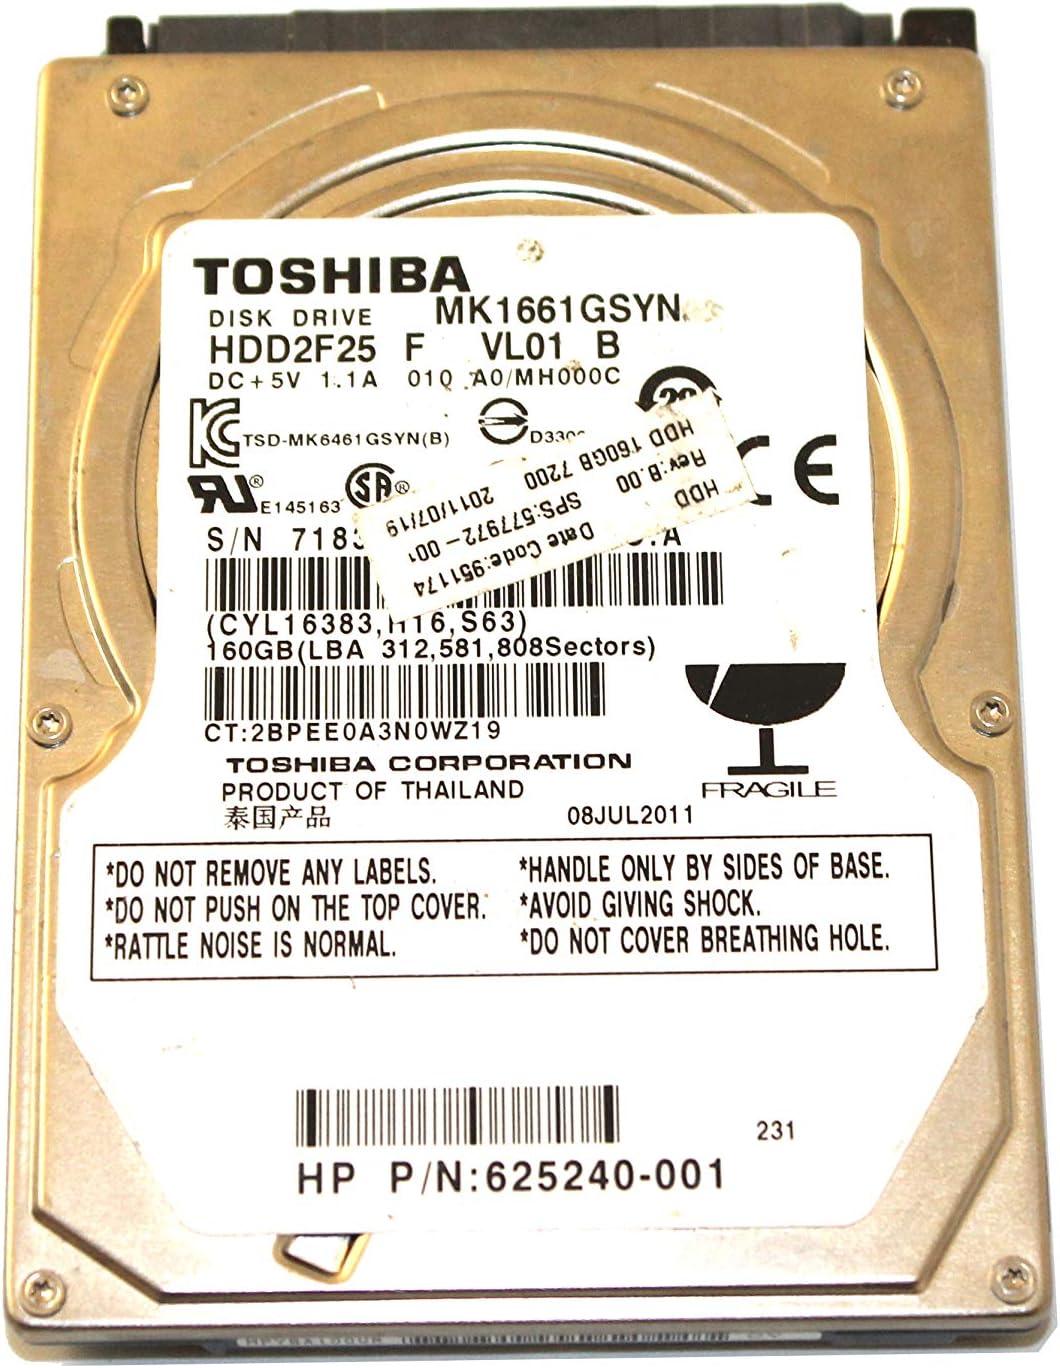 577972-001 Toshiba MK1661GSYN 160GB 7200 RPM 2.5 Laptop Hard Drive